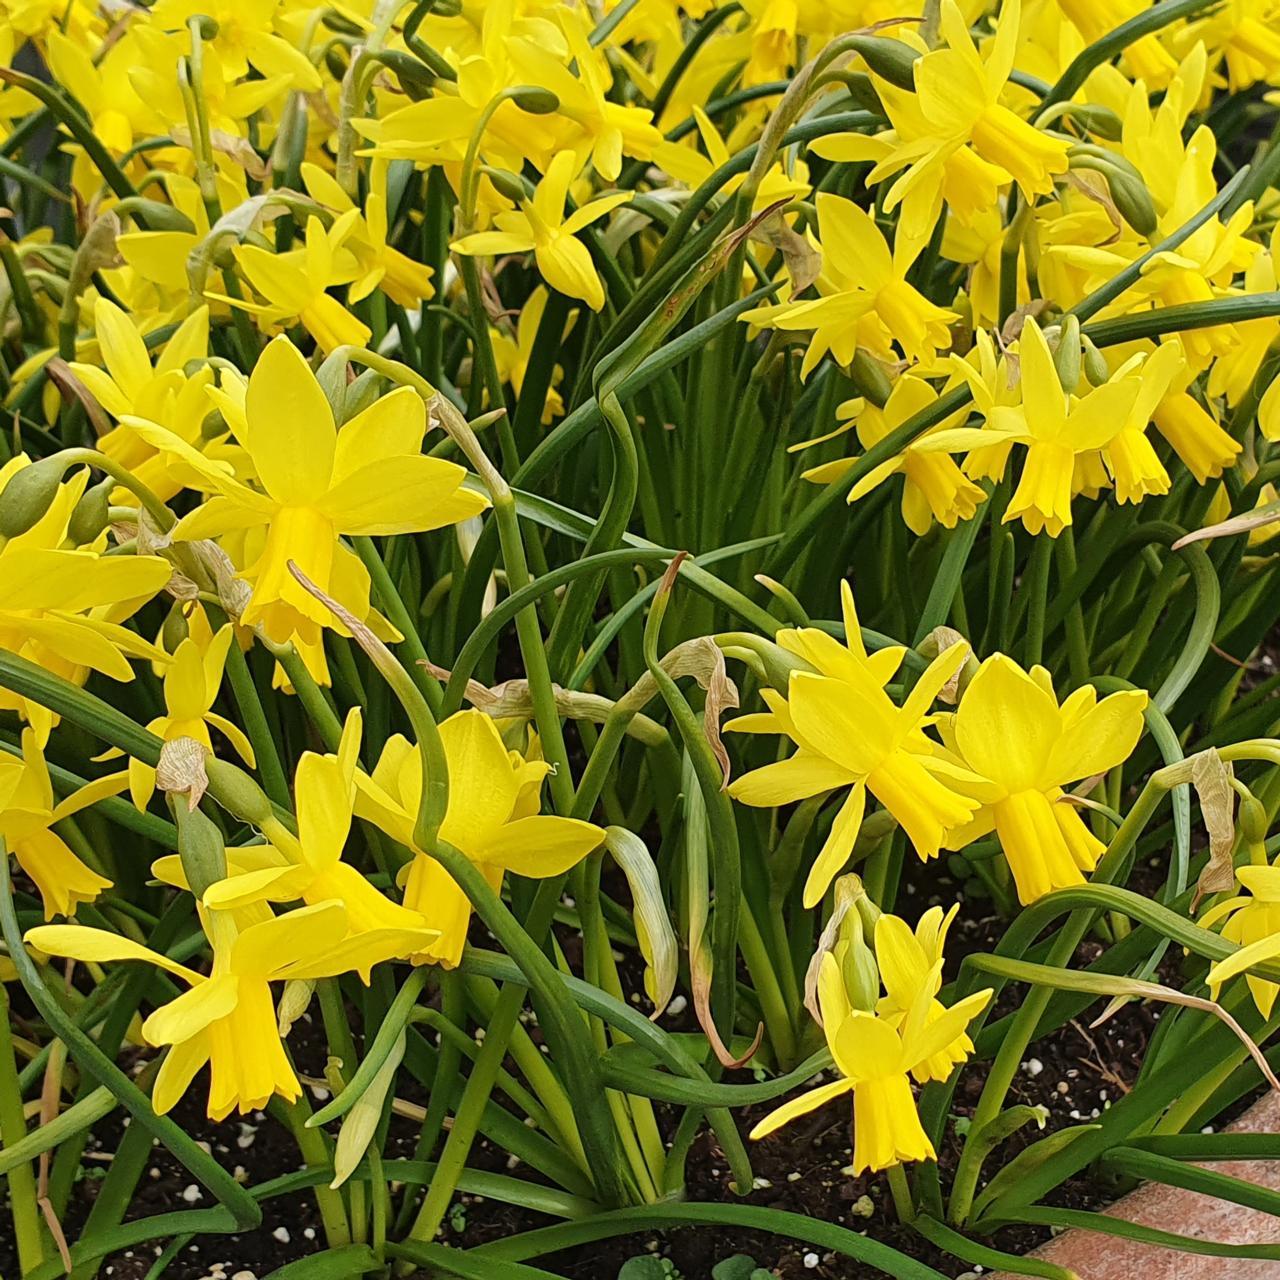 Narcissus 'Tiny Bubbles' plant